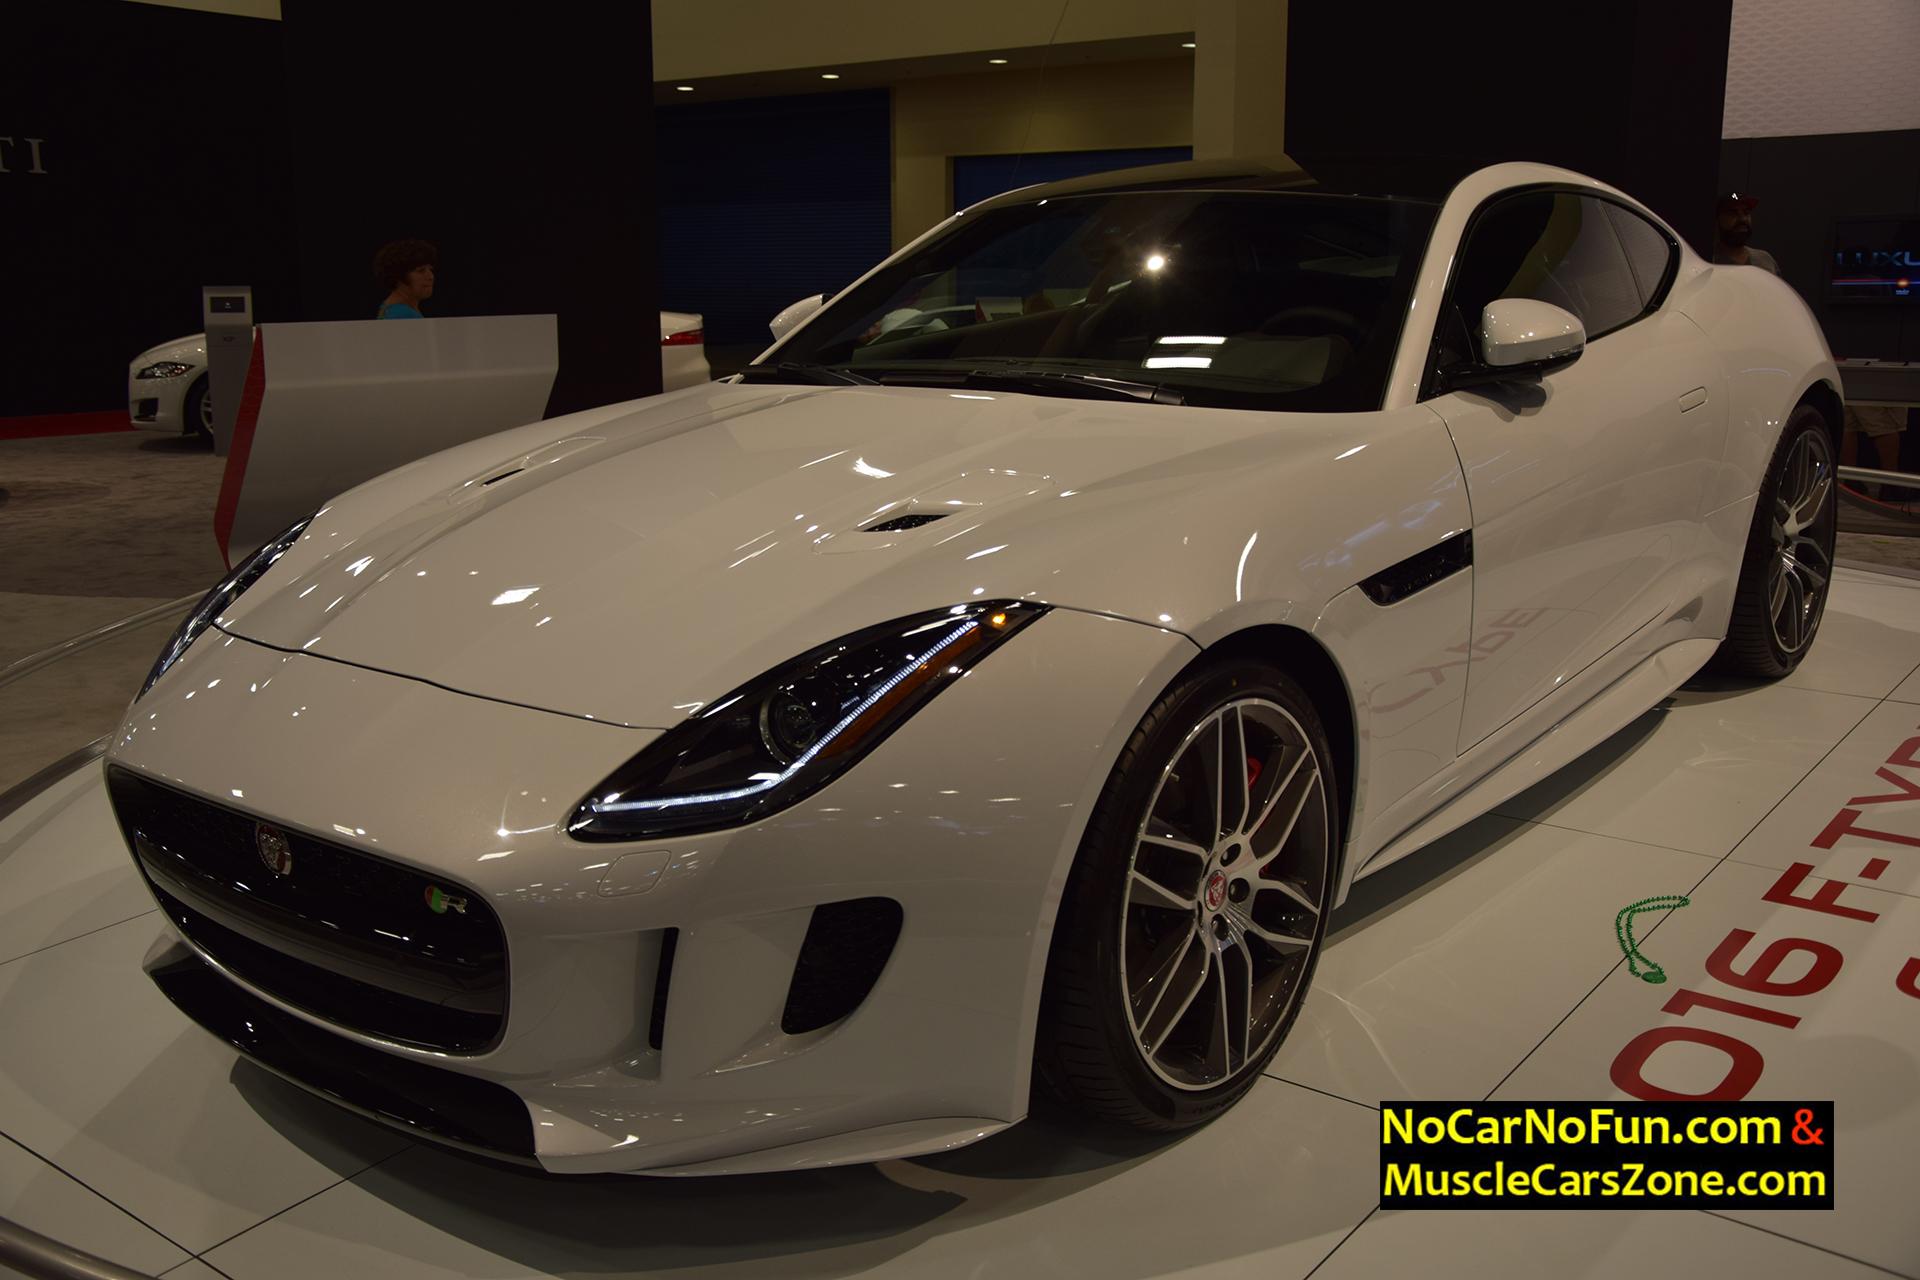 2016 Jaguar F-Type Coupe - Miami Auto Show 2015 5 - Muscle Cars Zone!